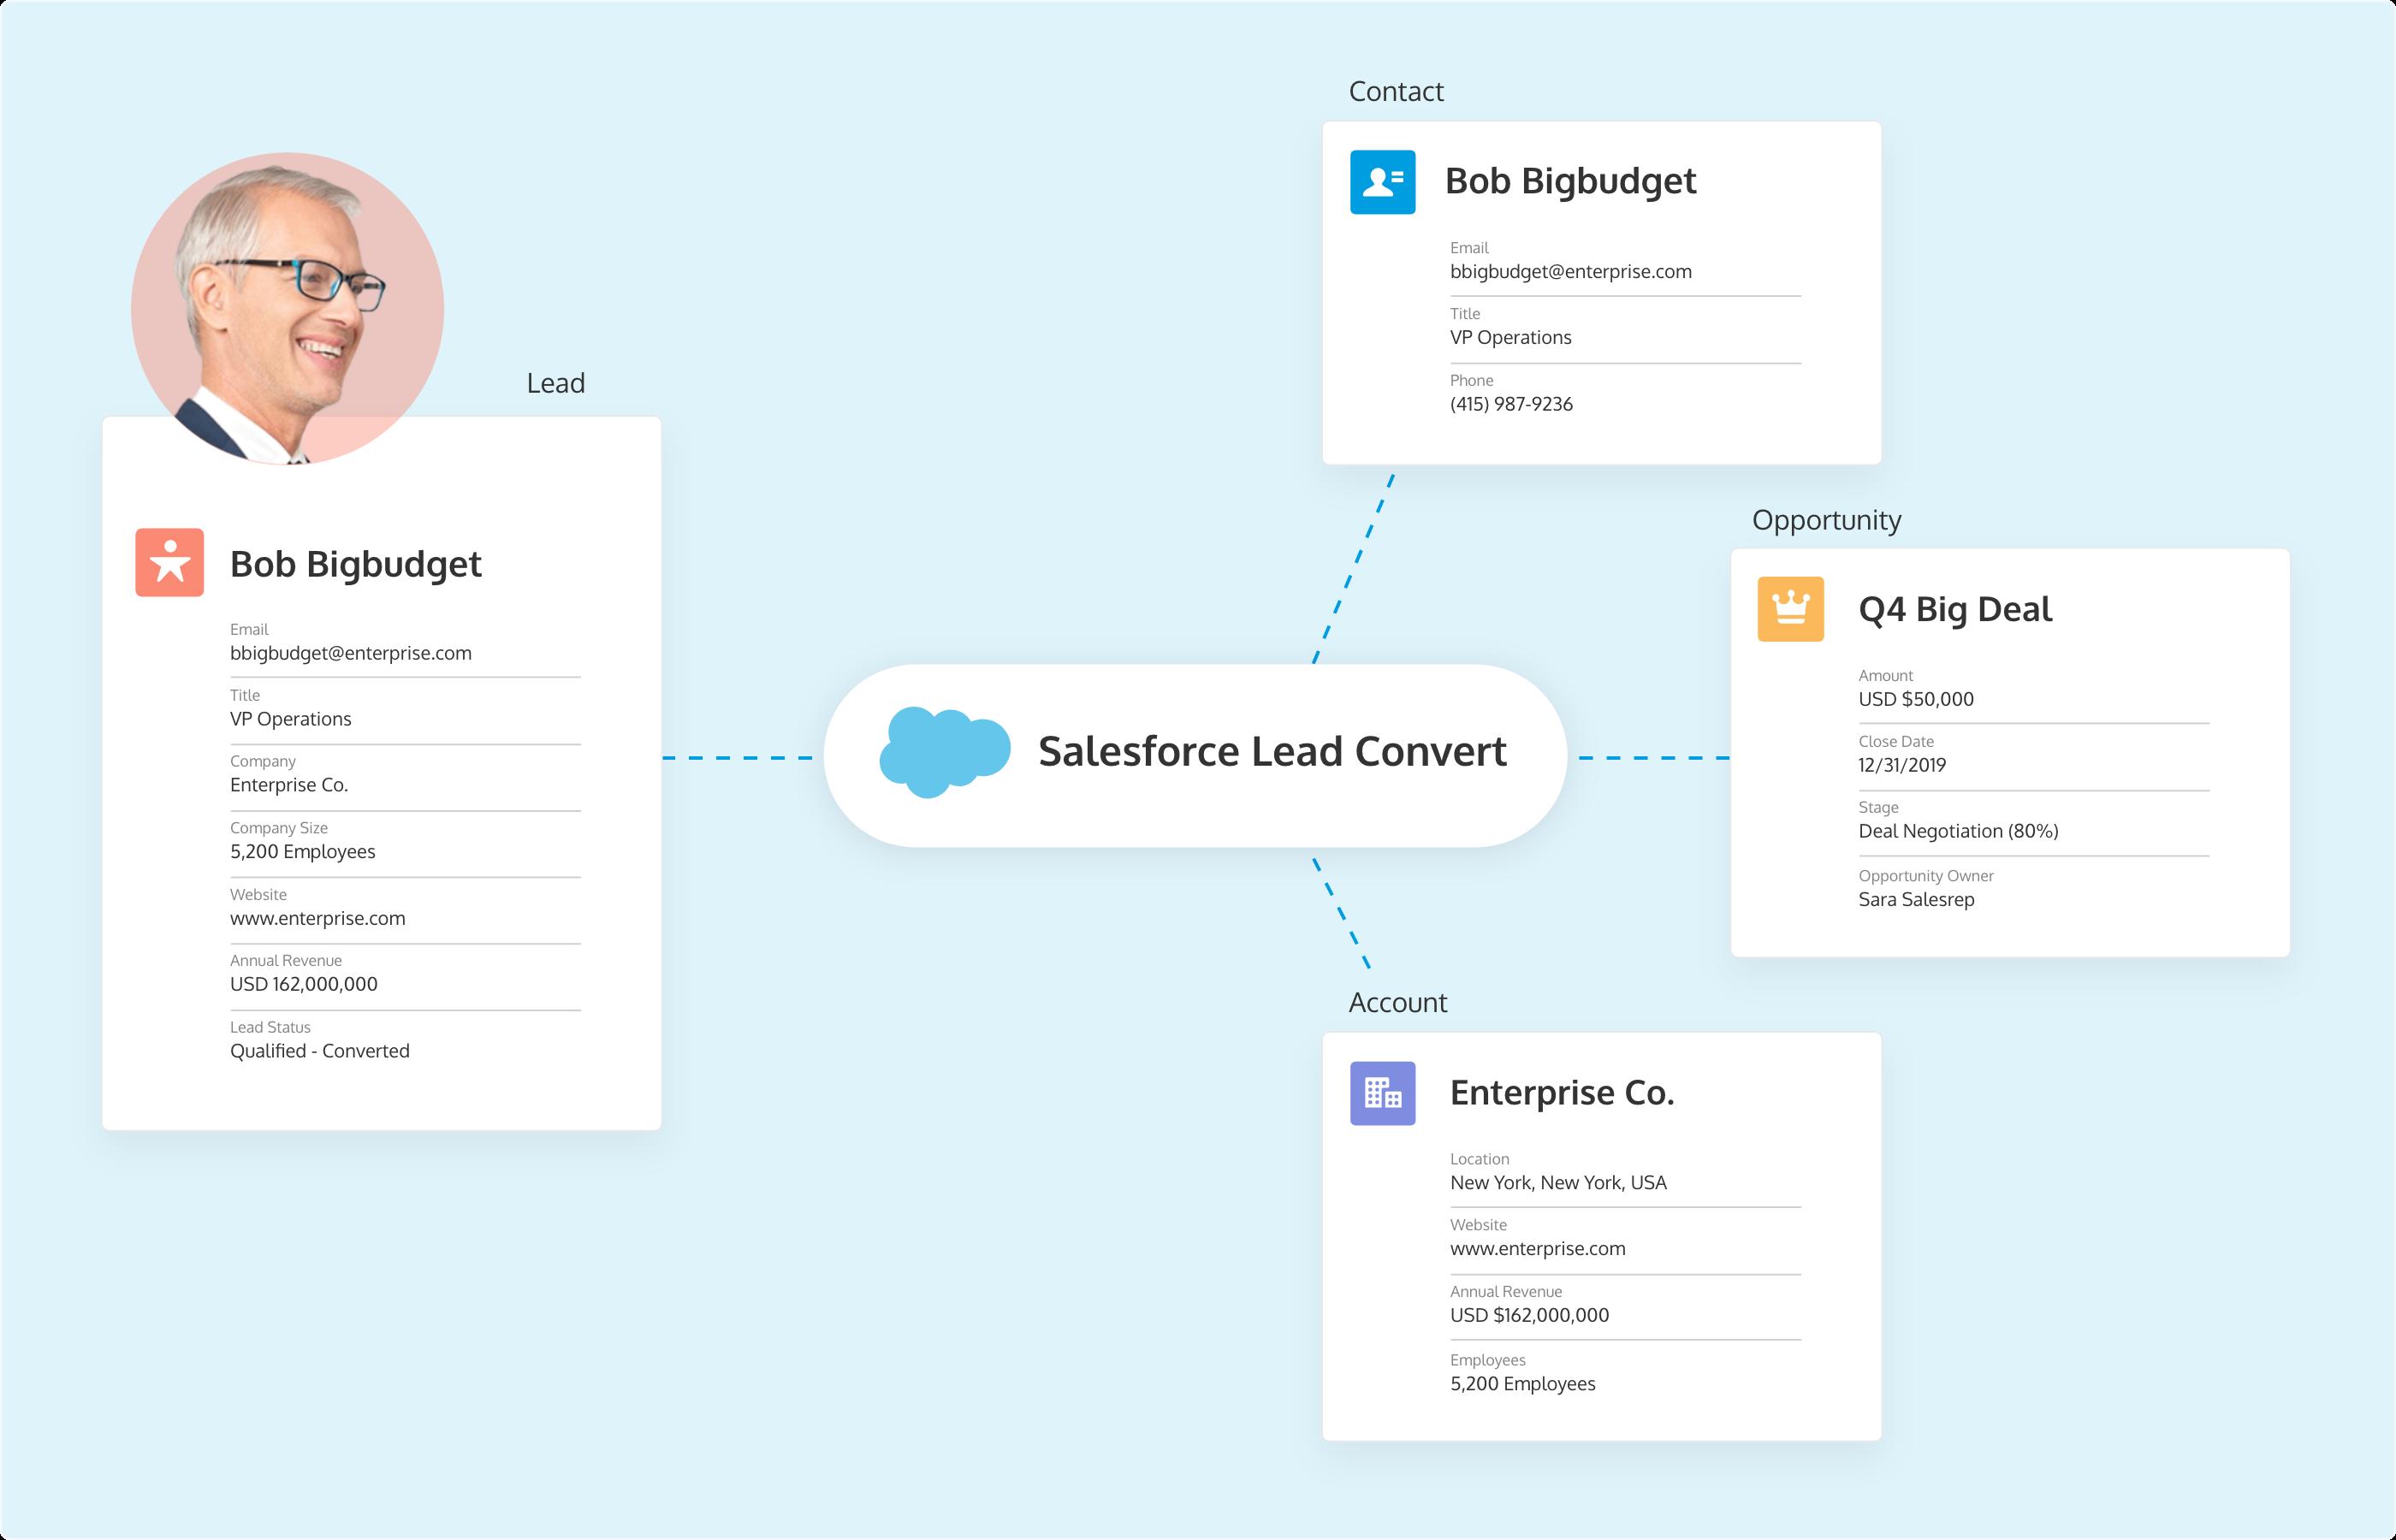 The Salesforce Lead conversion (Salesforce lead convert) process explained